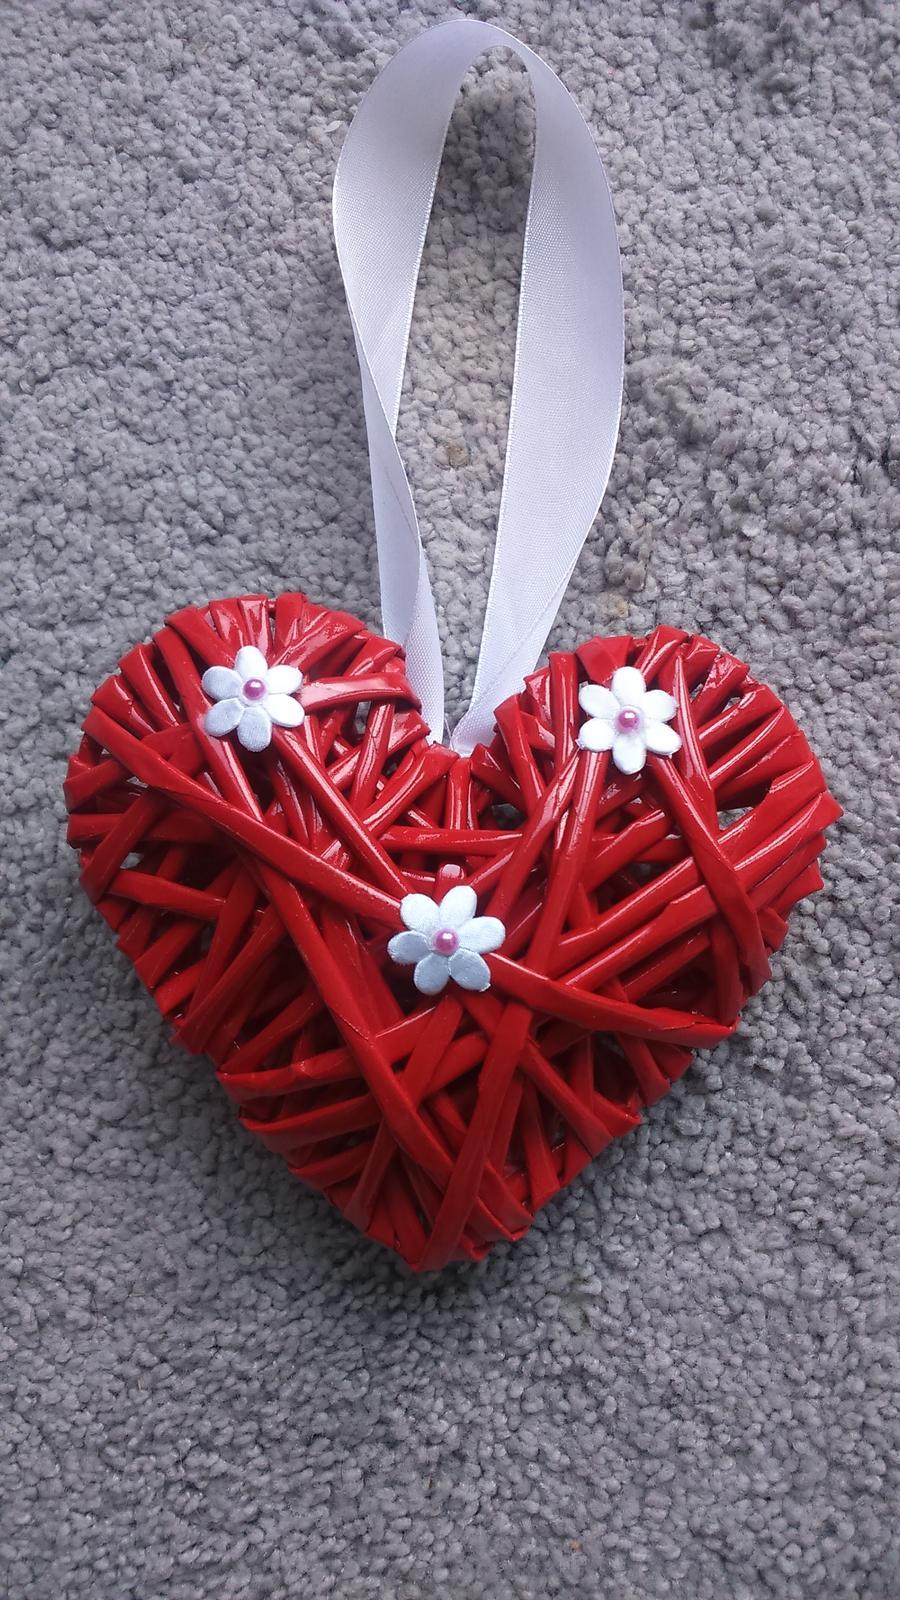 Pletené srdce - Obrázek č. 1